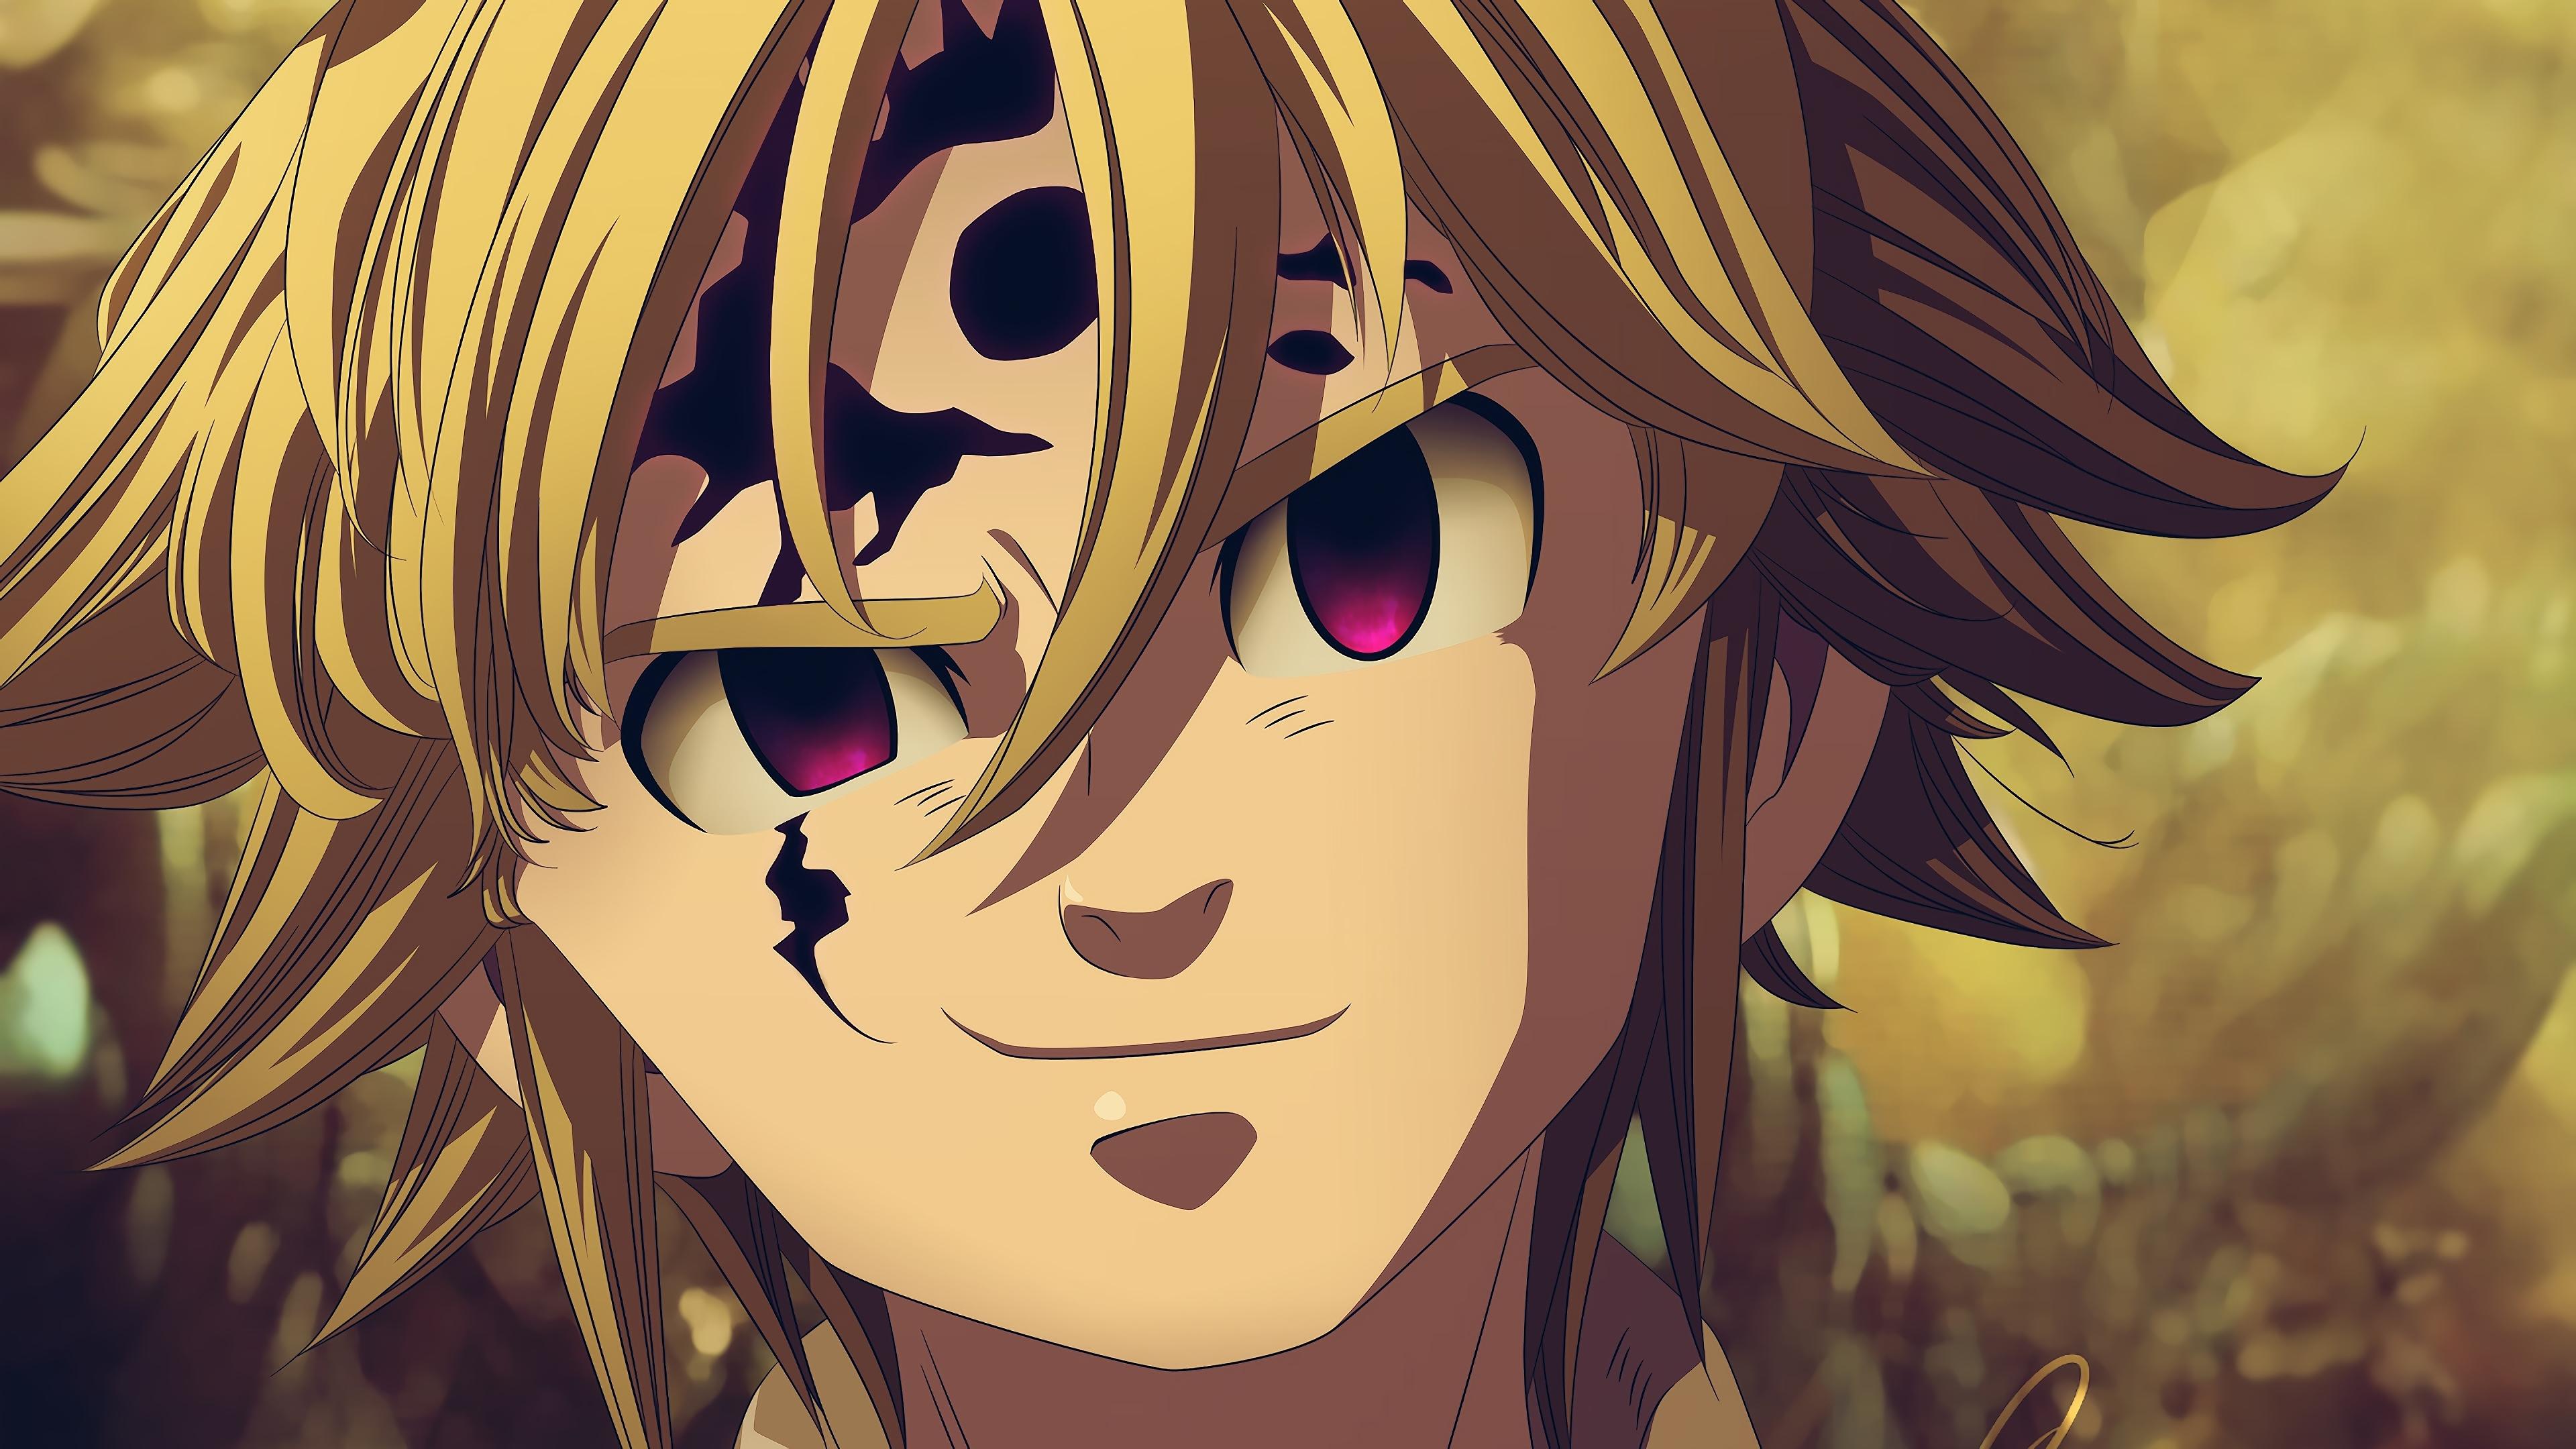 Return Of The King Demon Wallpaper Hd Anime 4k Wallpapers Images